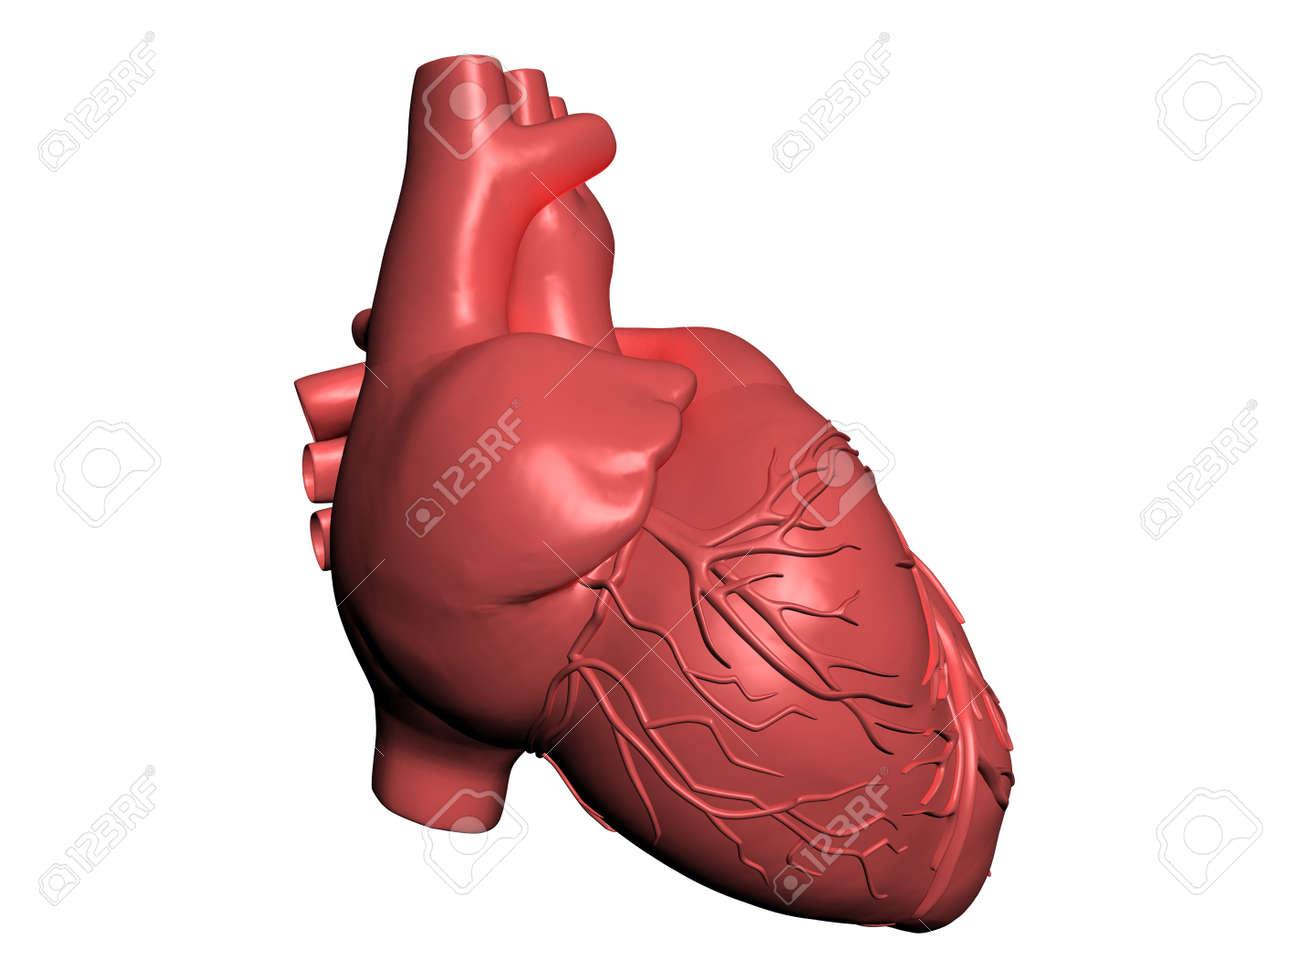 heart muscle anatomy choice image - learn human anatomy image, Muscles